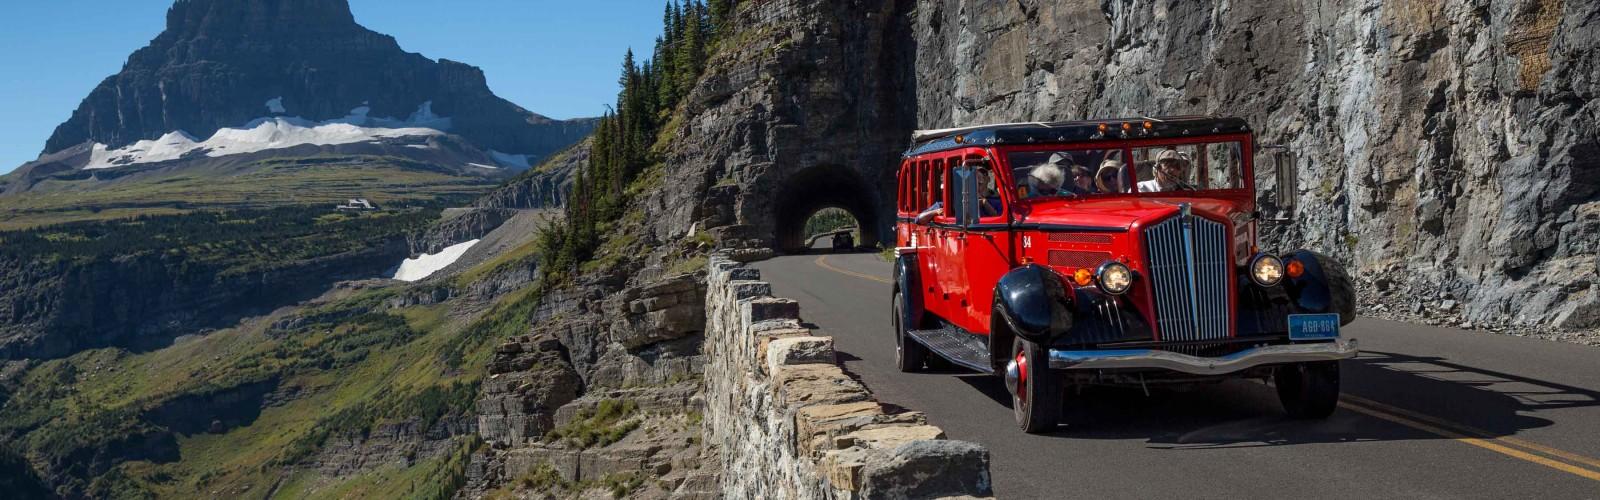 Jammer bus , glacier national park red jammer bus tours